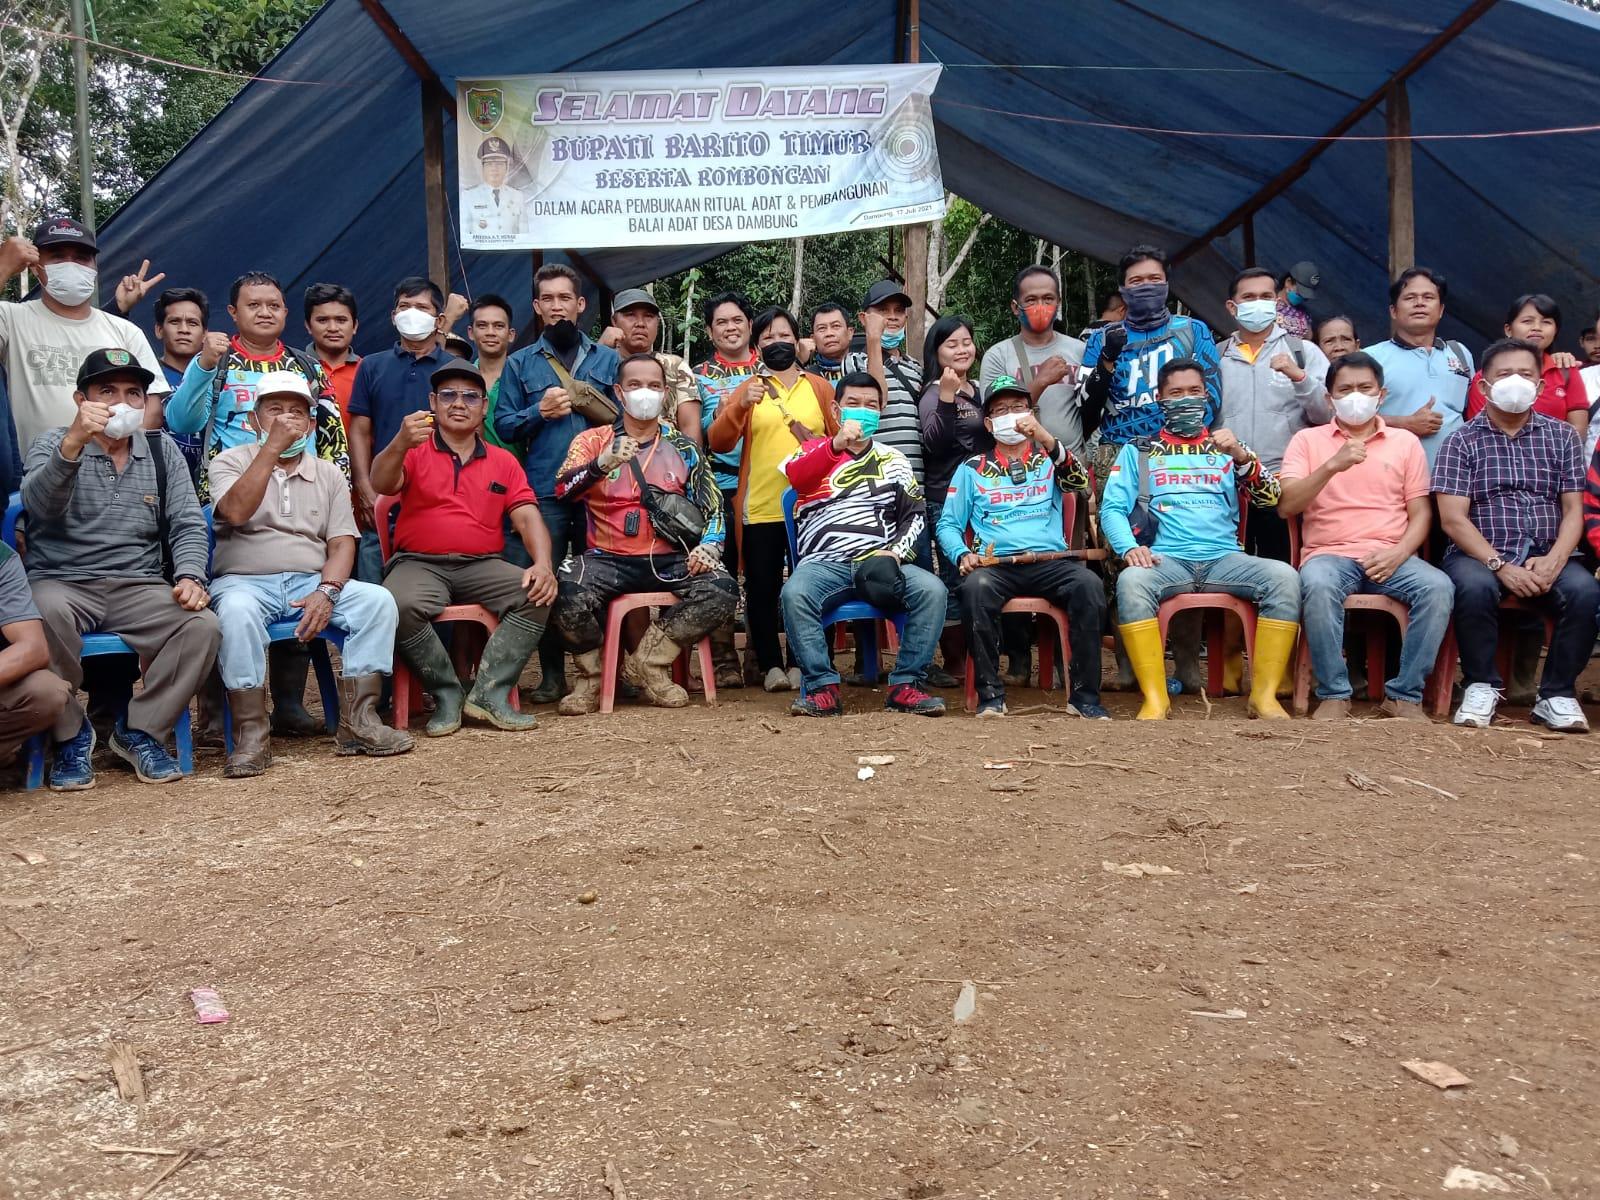 Acara peresmian pembangunan balai adat serta pembukaan upacara adat di Desa Dambung, Kecamatan Dusun Tengah, Sabtu (17/7/2021)